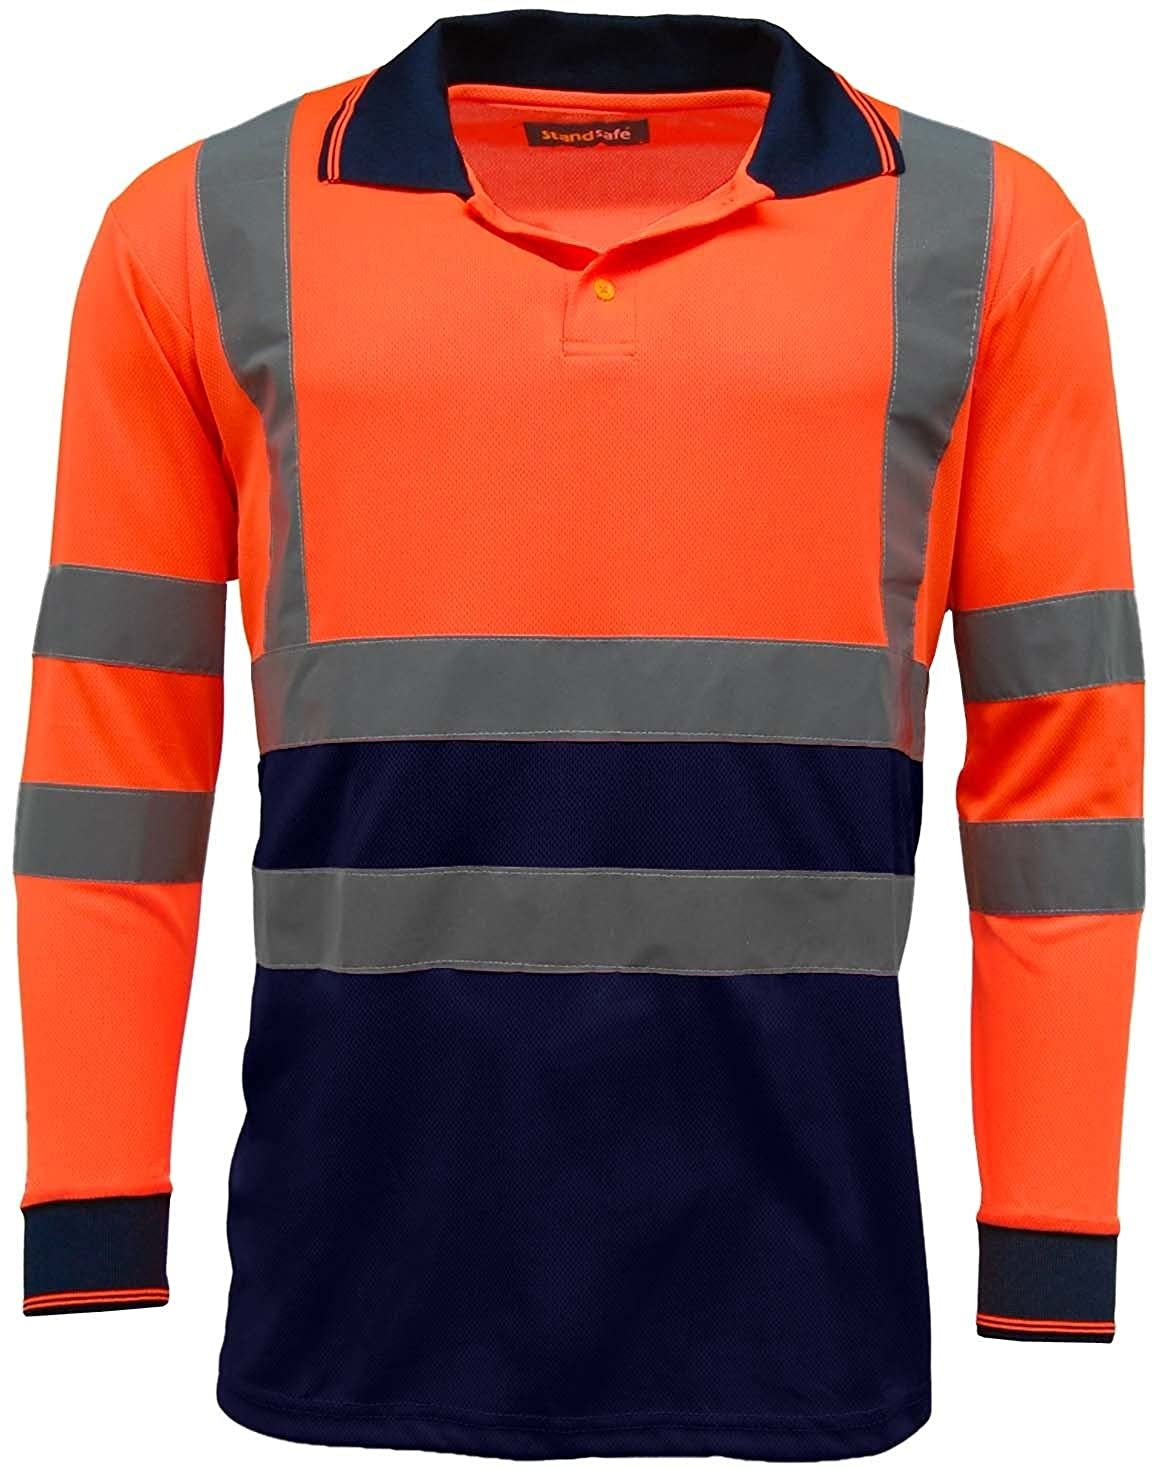 Mens Hi Vis Hi Visibility Two Tone Safety Work Polo Shirt Long